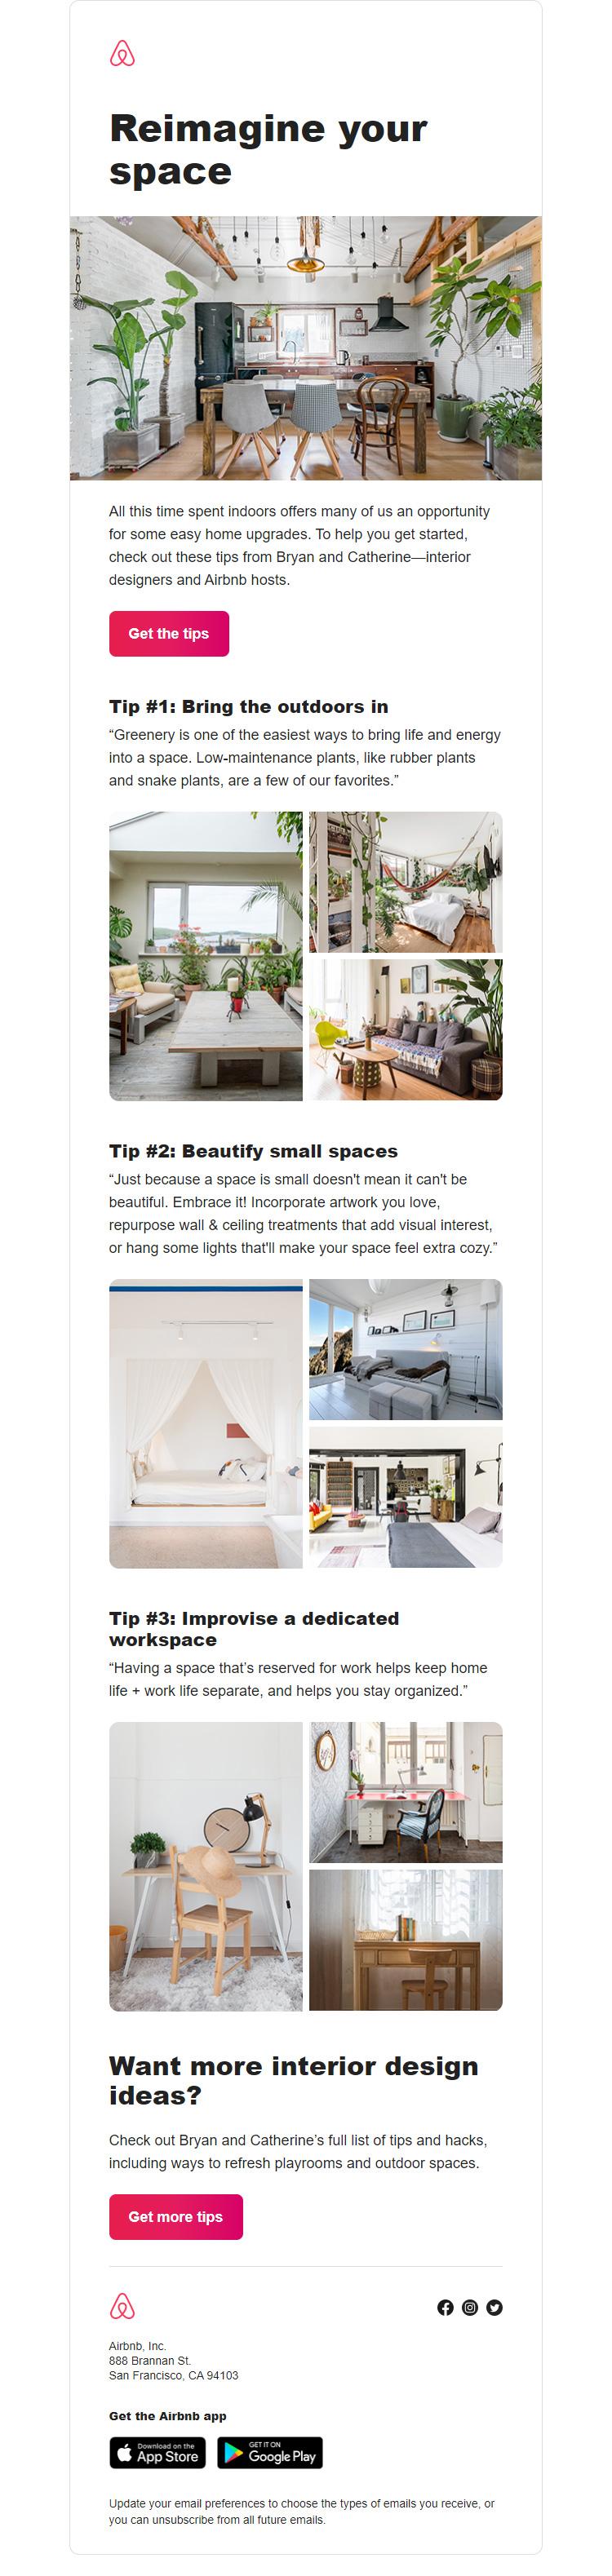 Customizable salesforce email templates